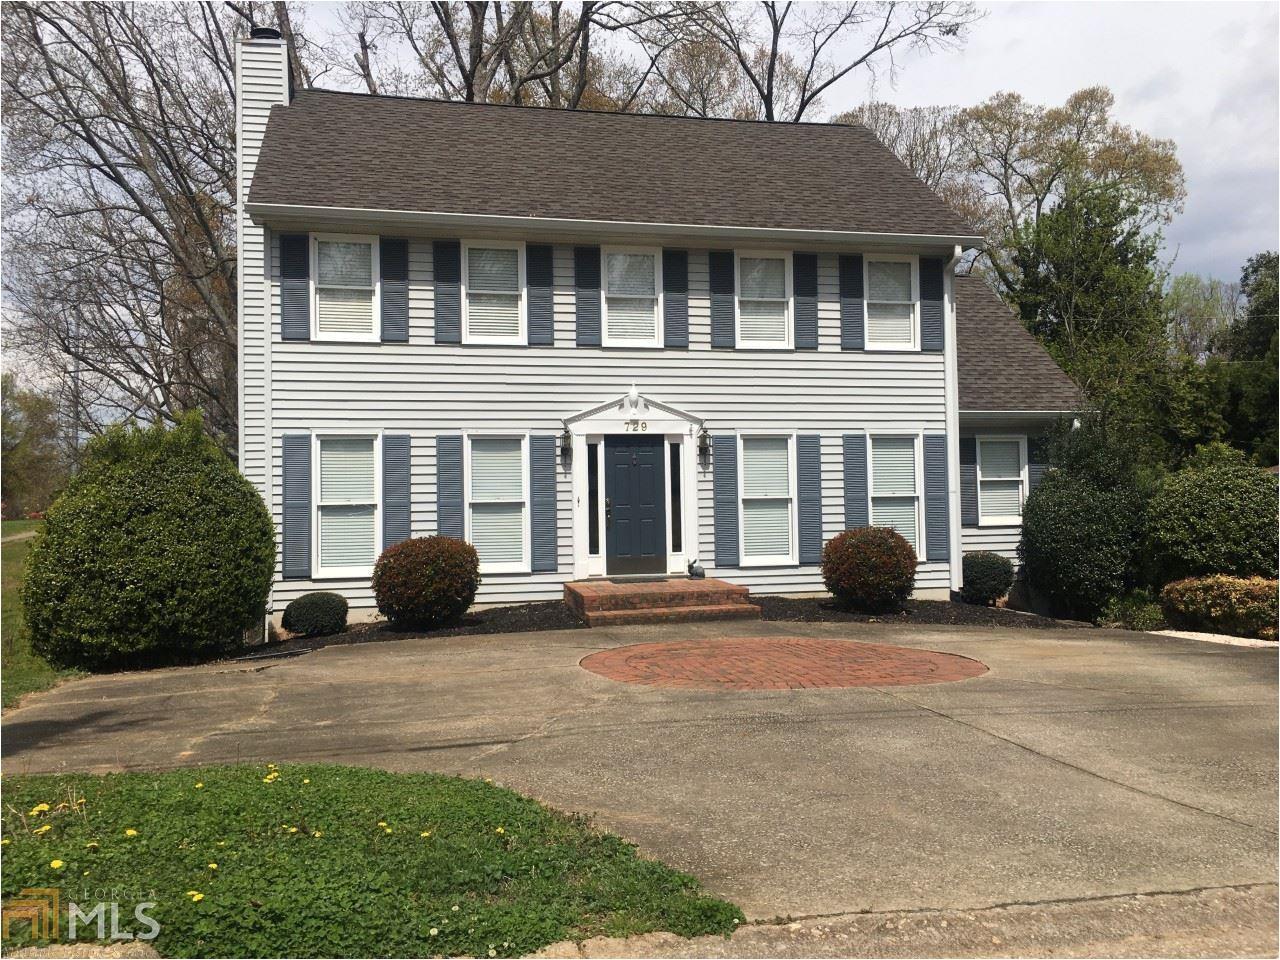 Homes for Sale In Gainesville Ga 729 Crestview Ter Gainesville Ga 30501 Georgia Mls